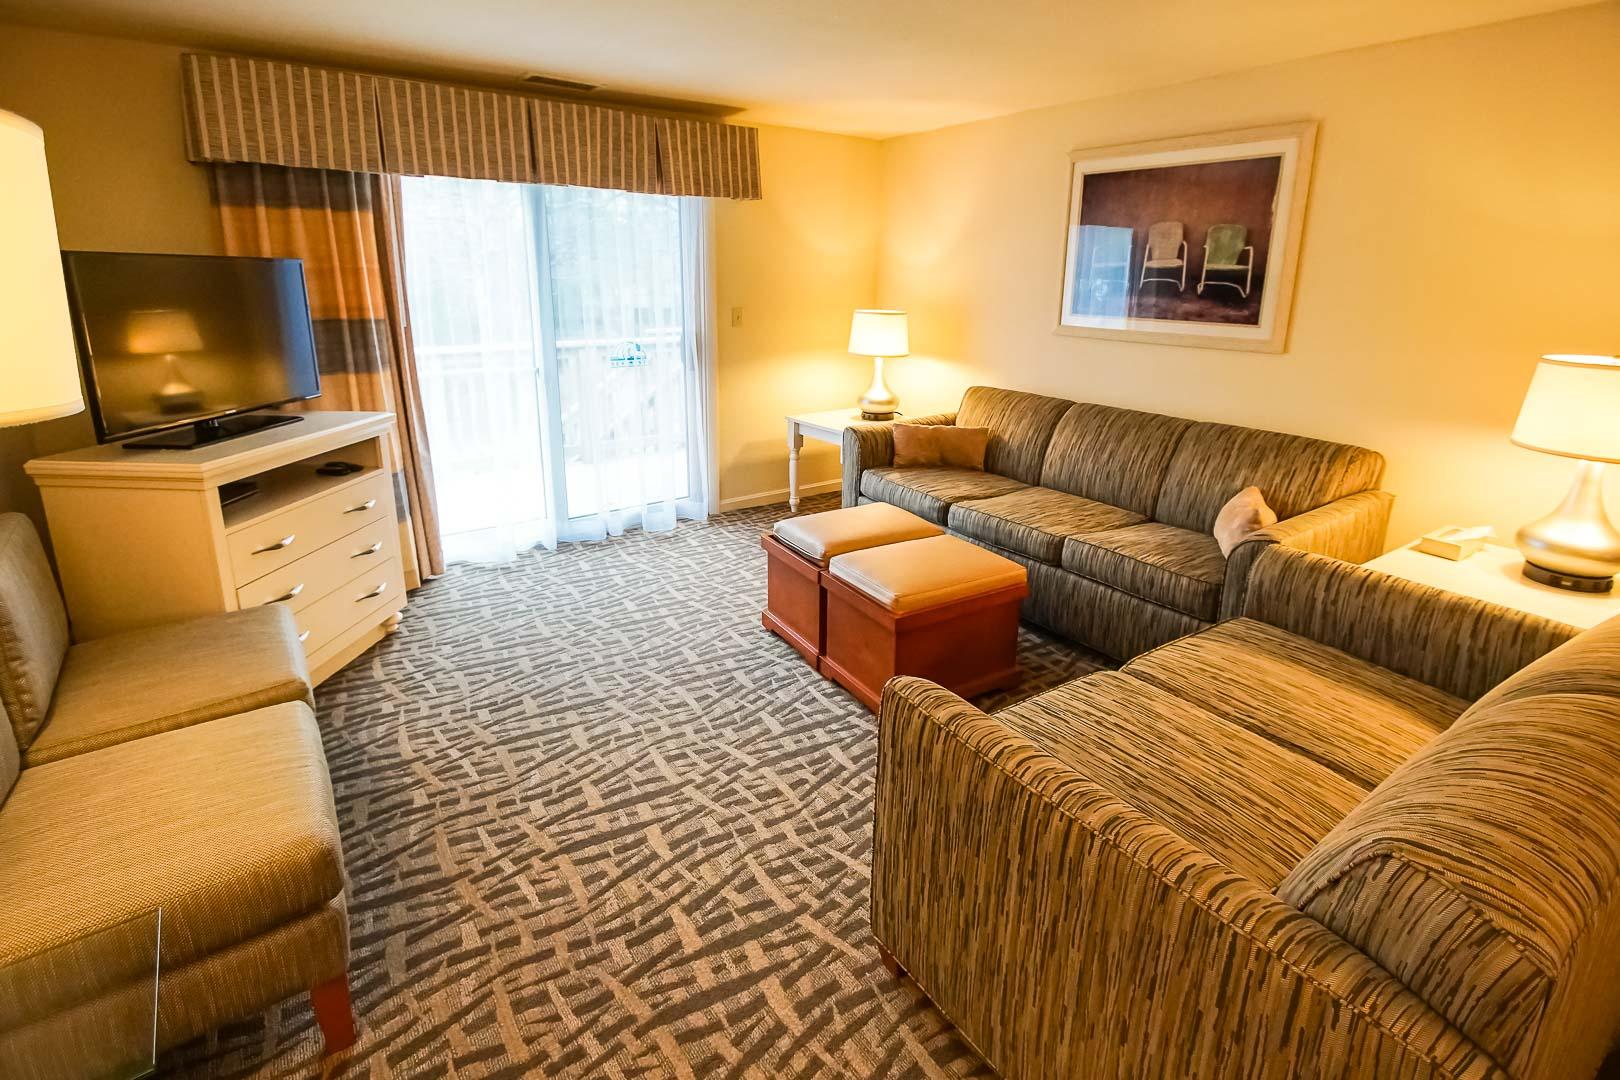 A cozy living room area at VRI's Sea Mist Resort in Massachusetts.